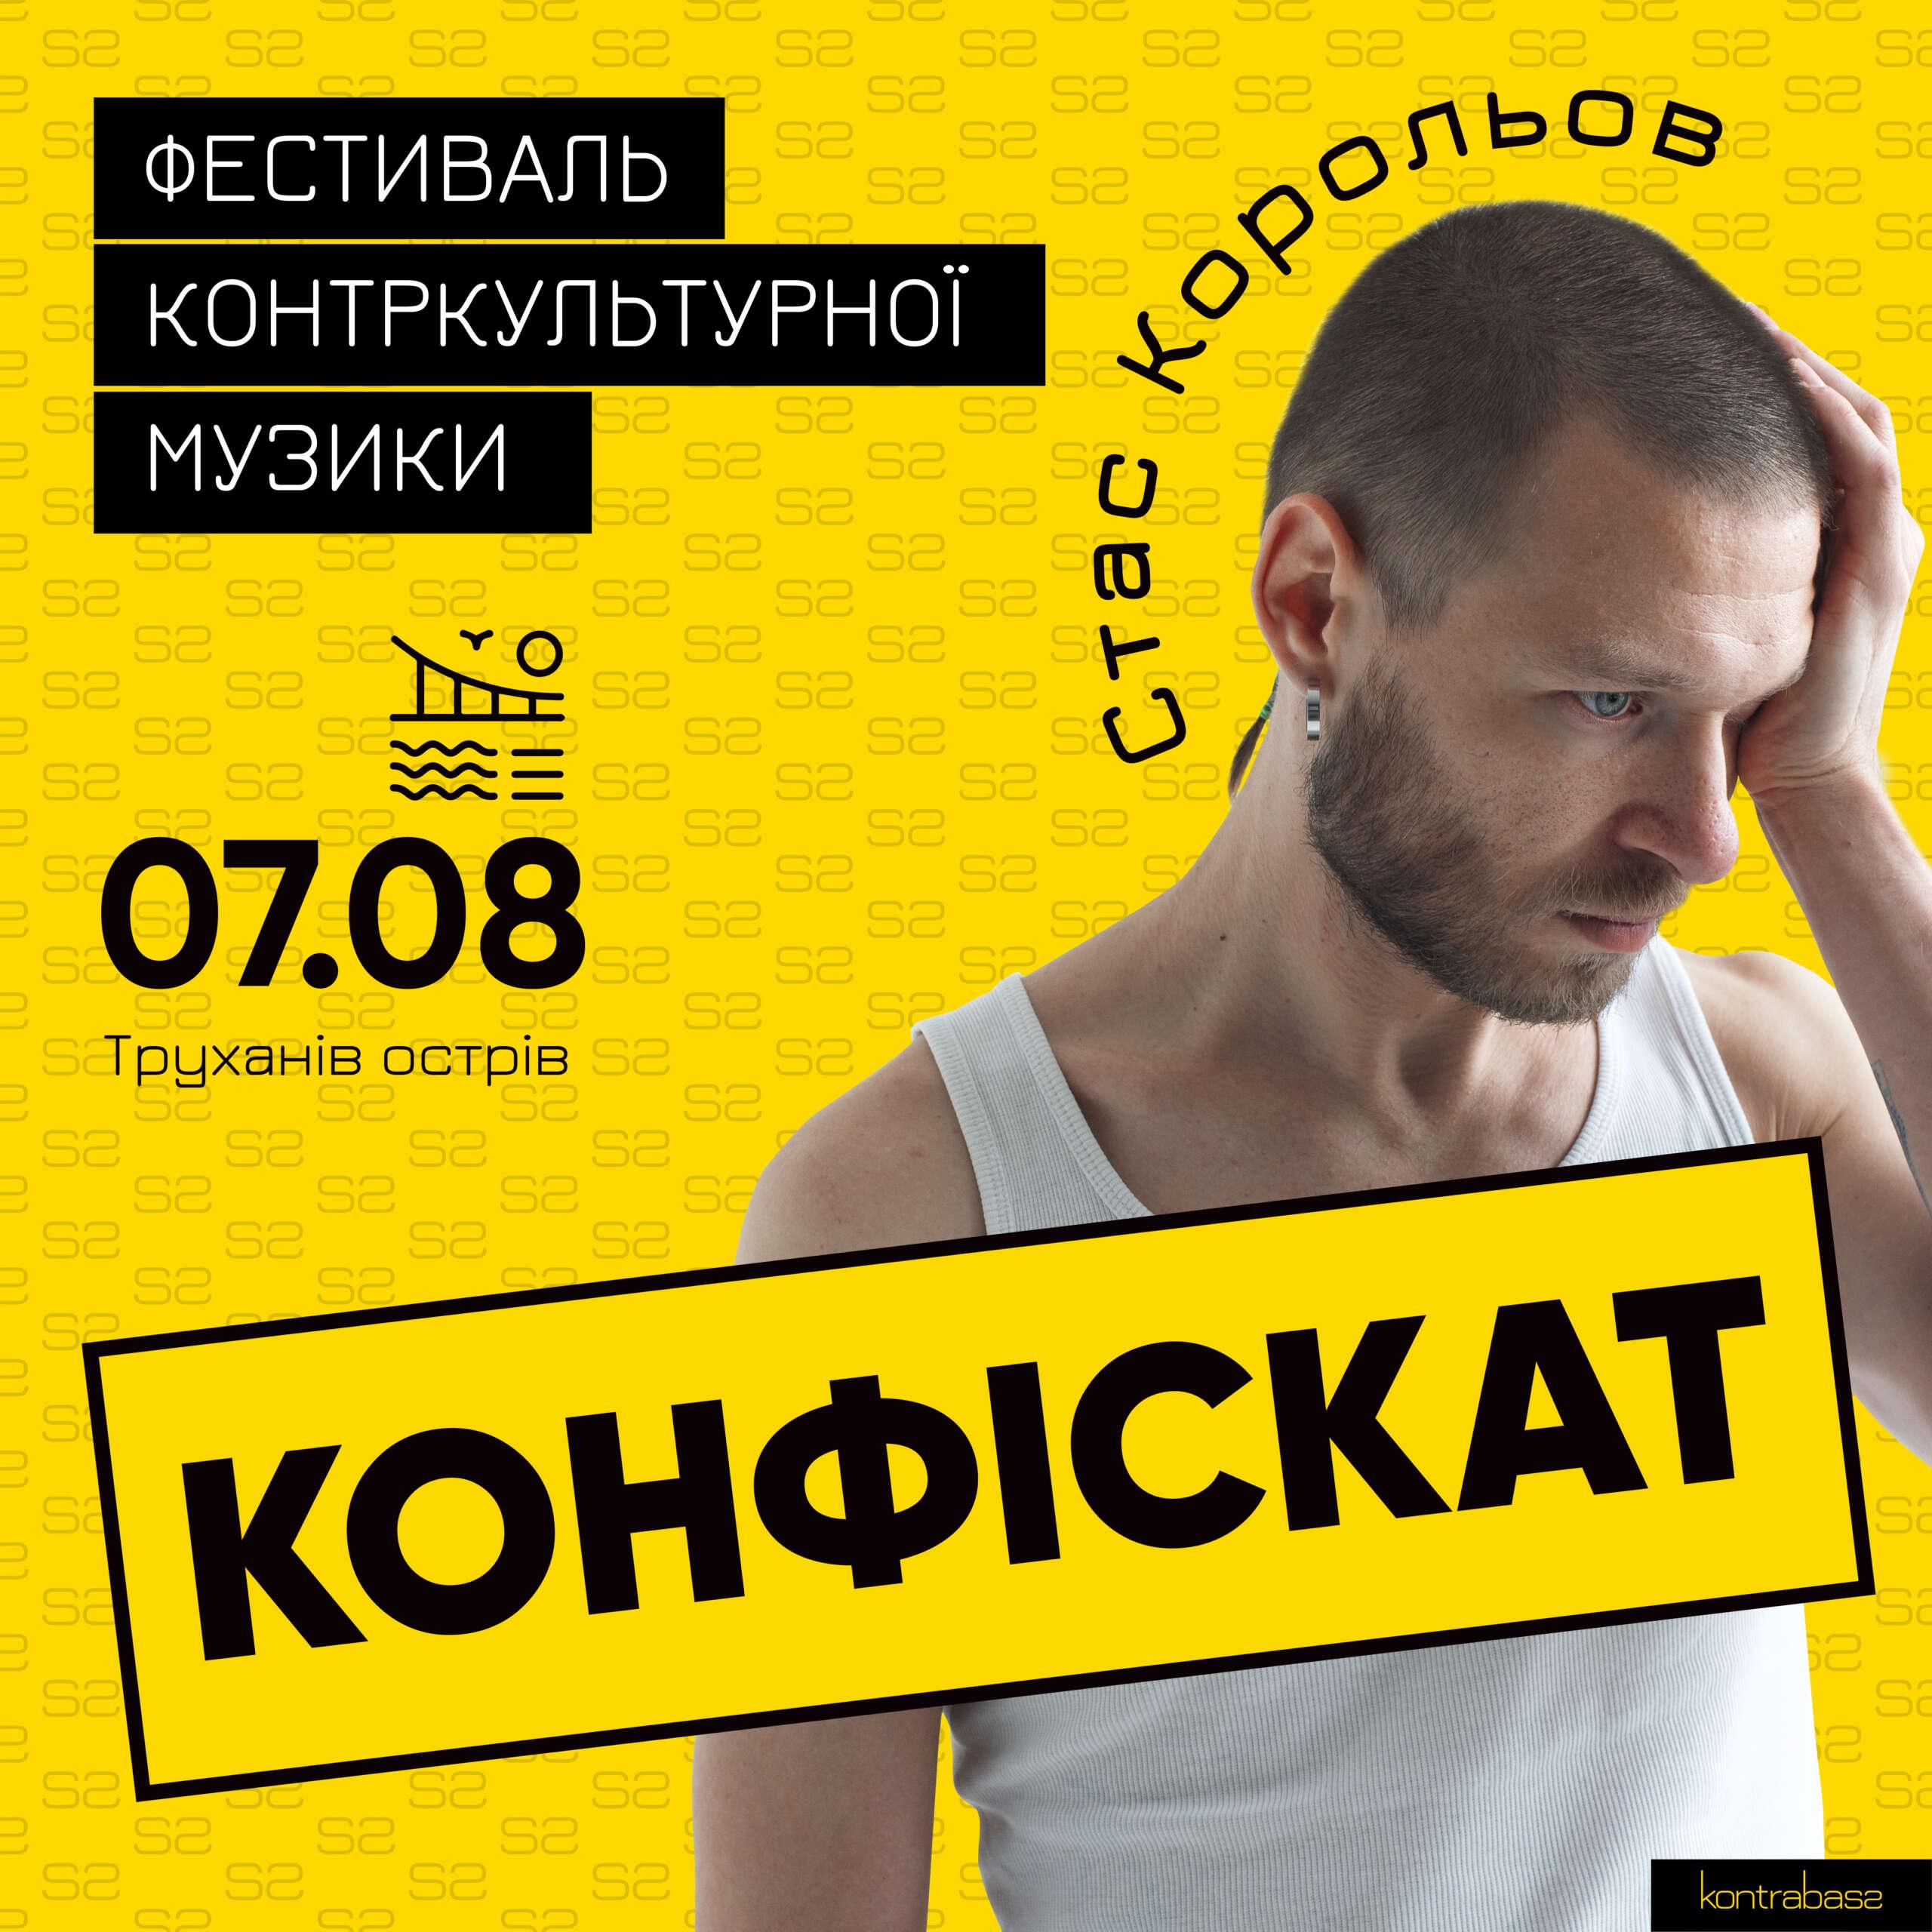 konfiskat-dtf-magazine4